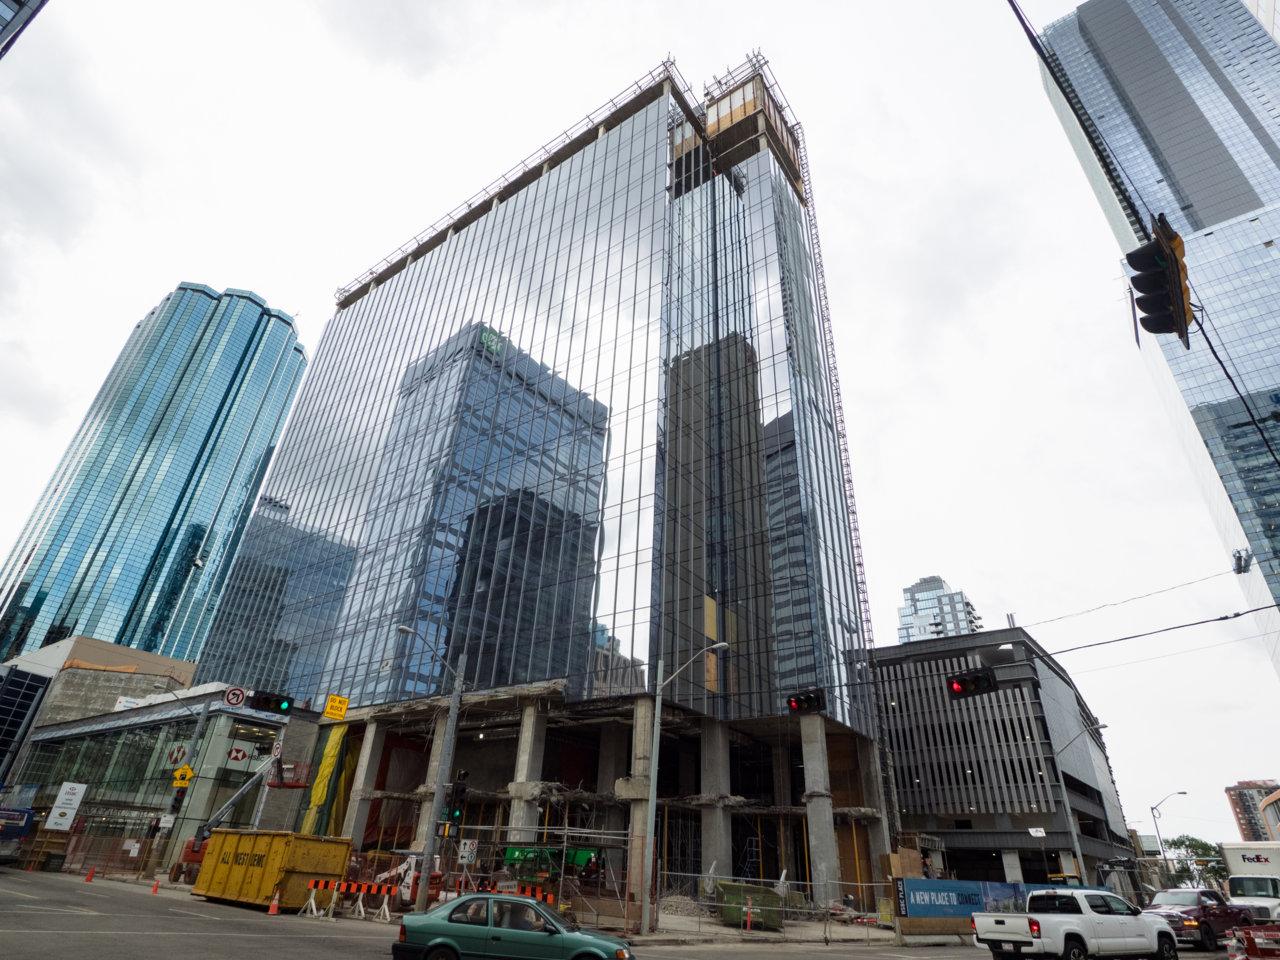 HSBC Bank Place Revitalization Making Steady Progress | SkyriseEdmonton